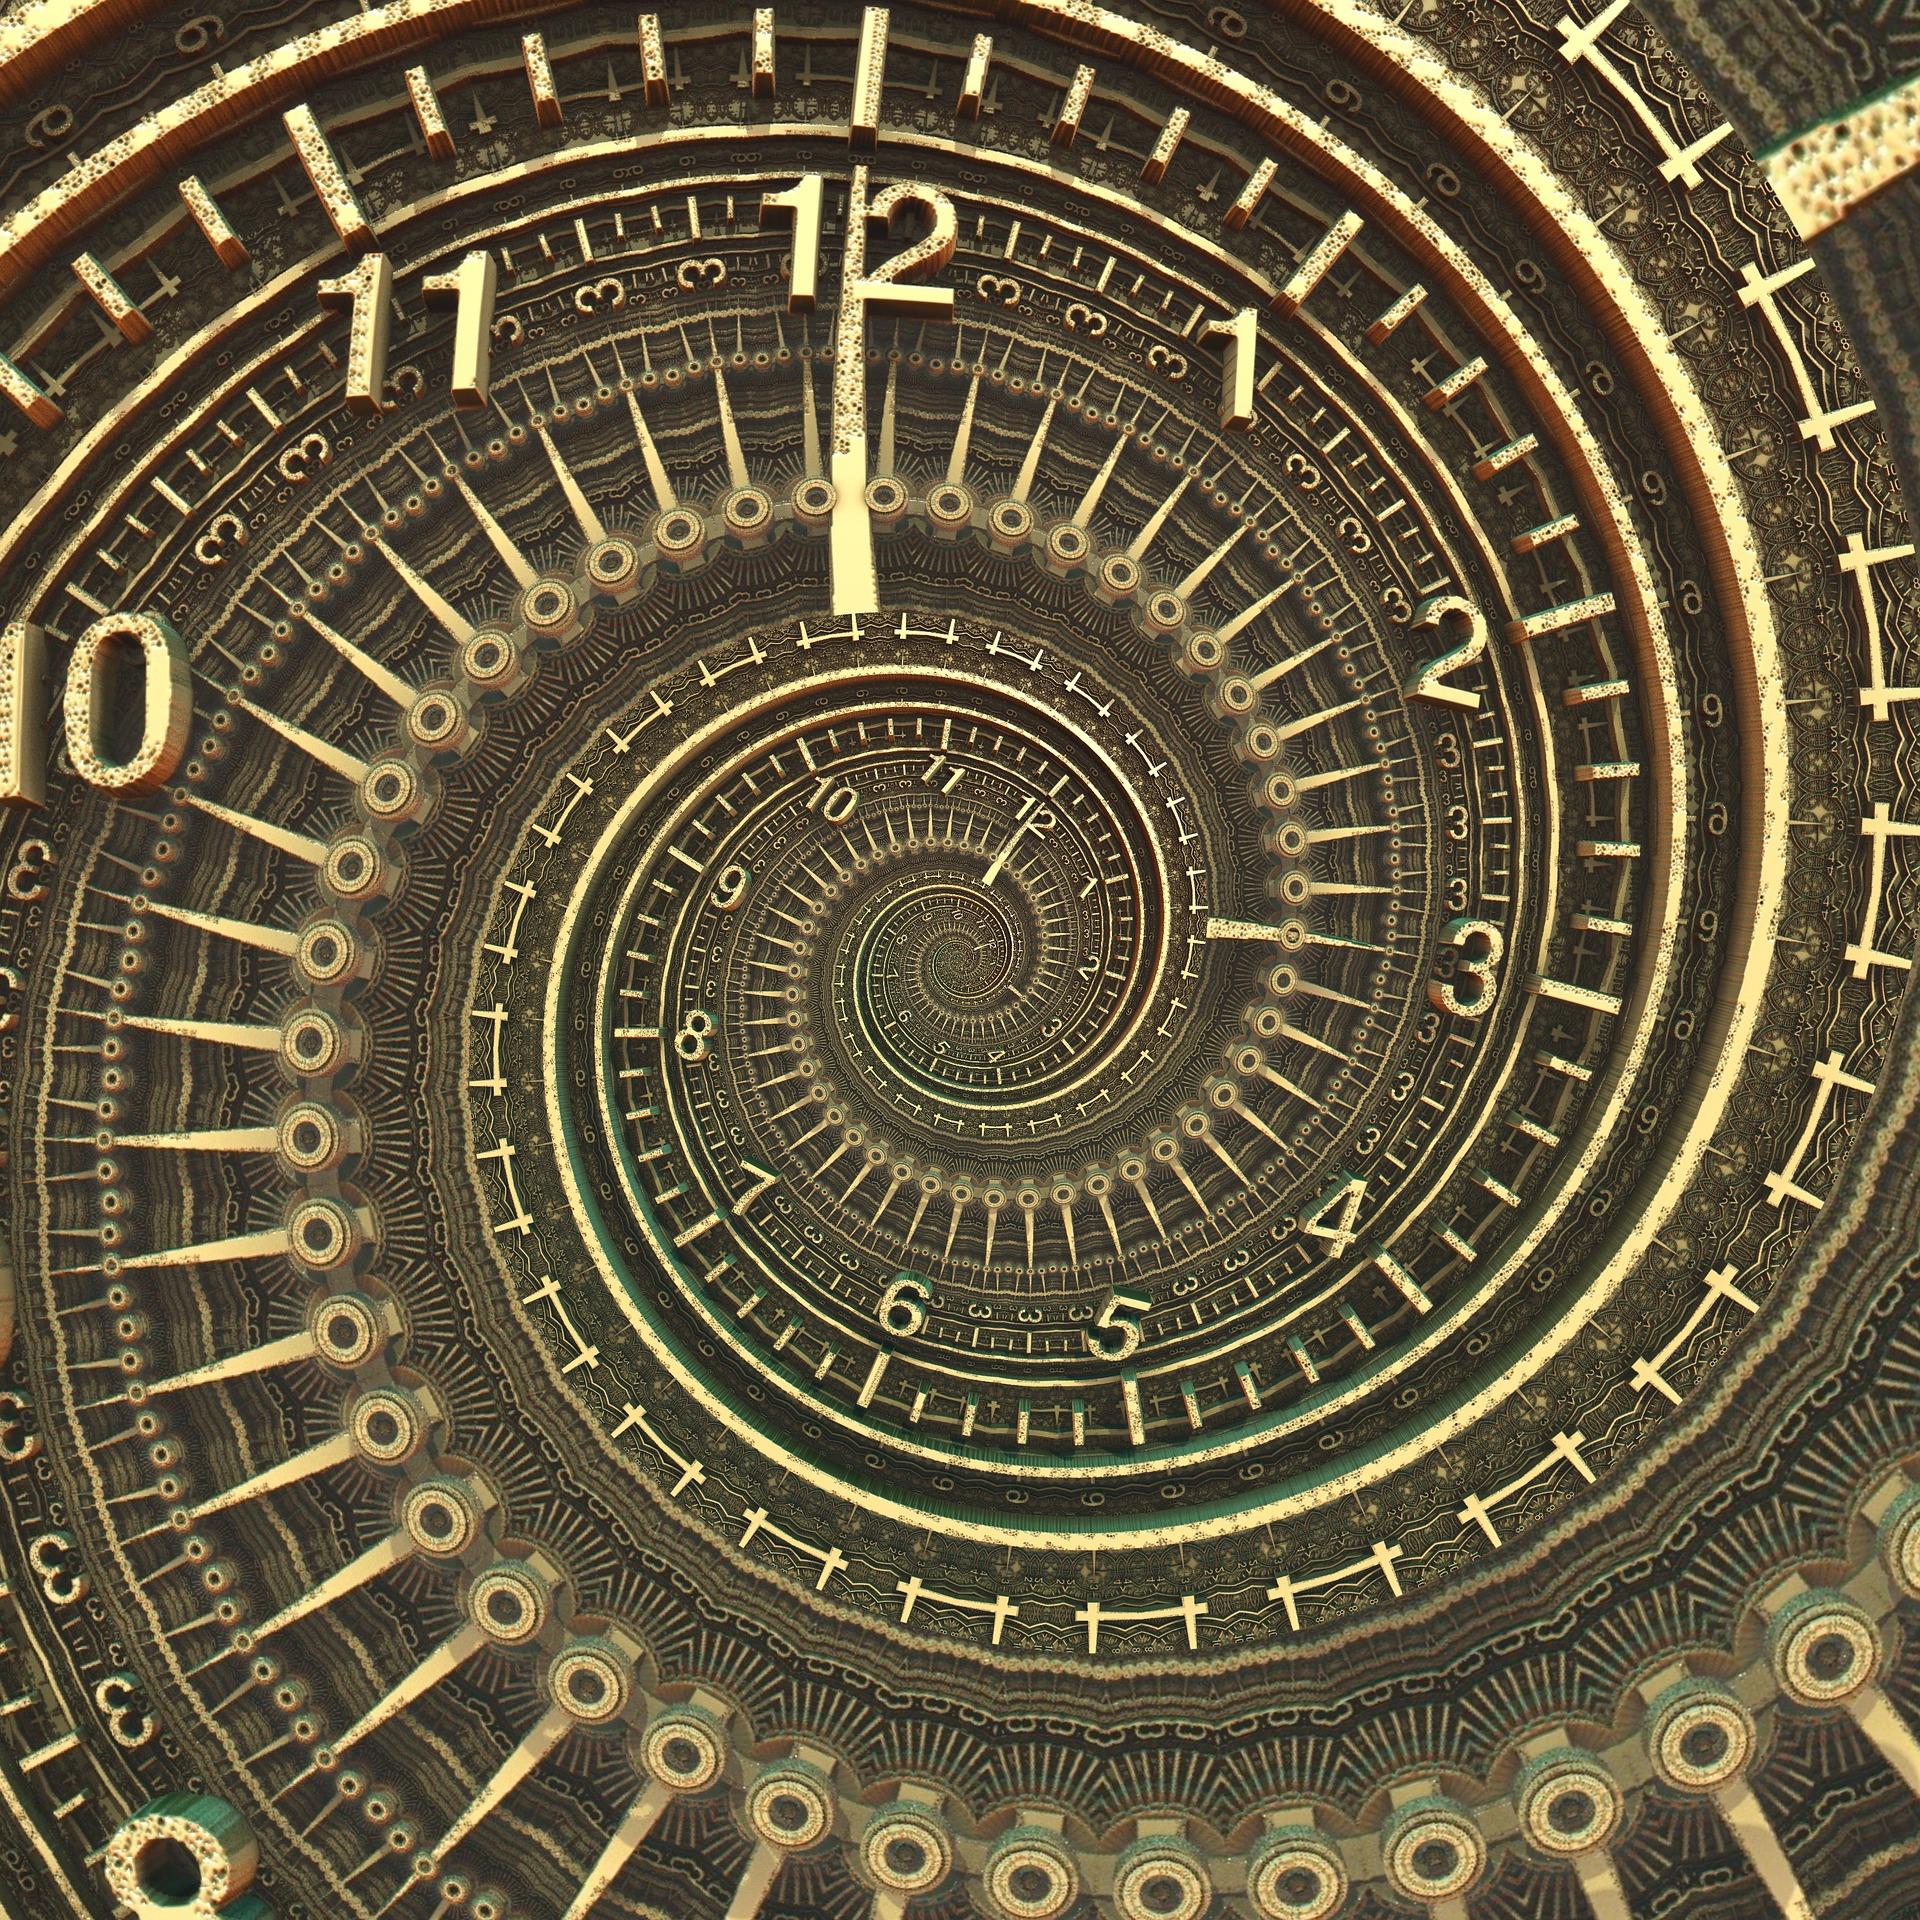 time-machine-1974990_1920.jpg